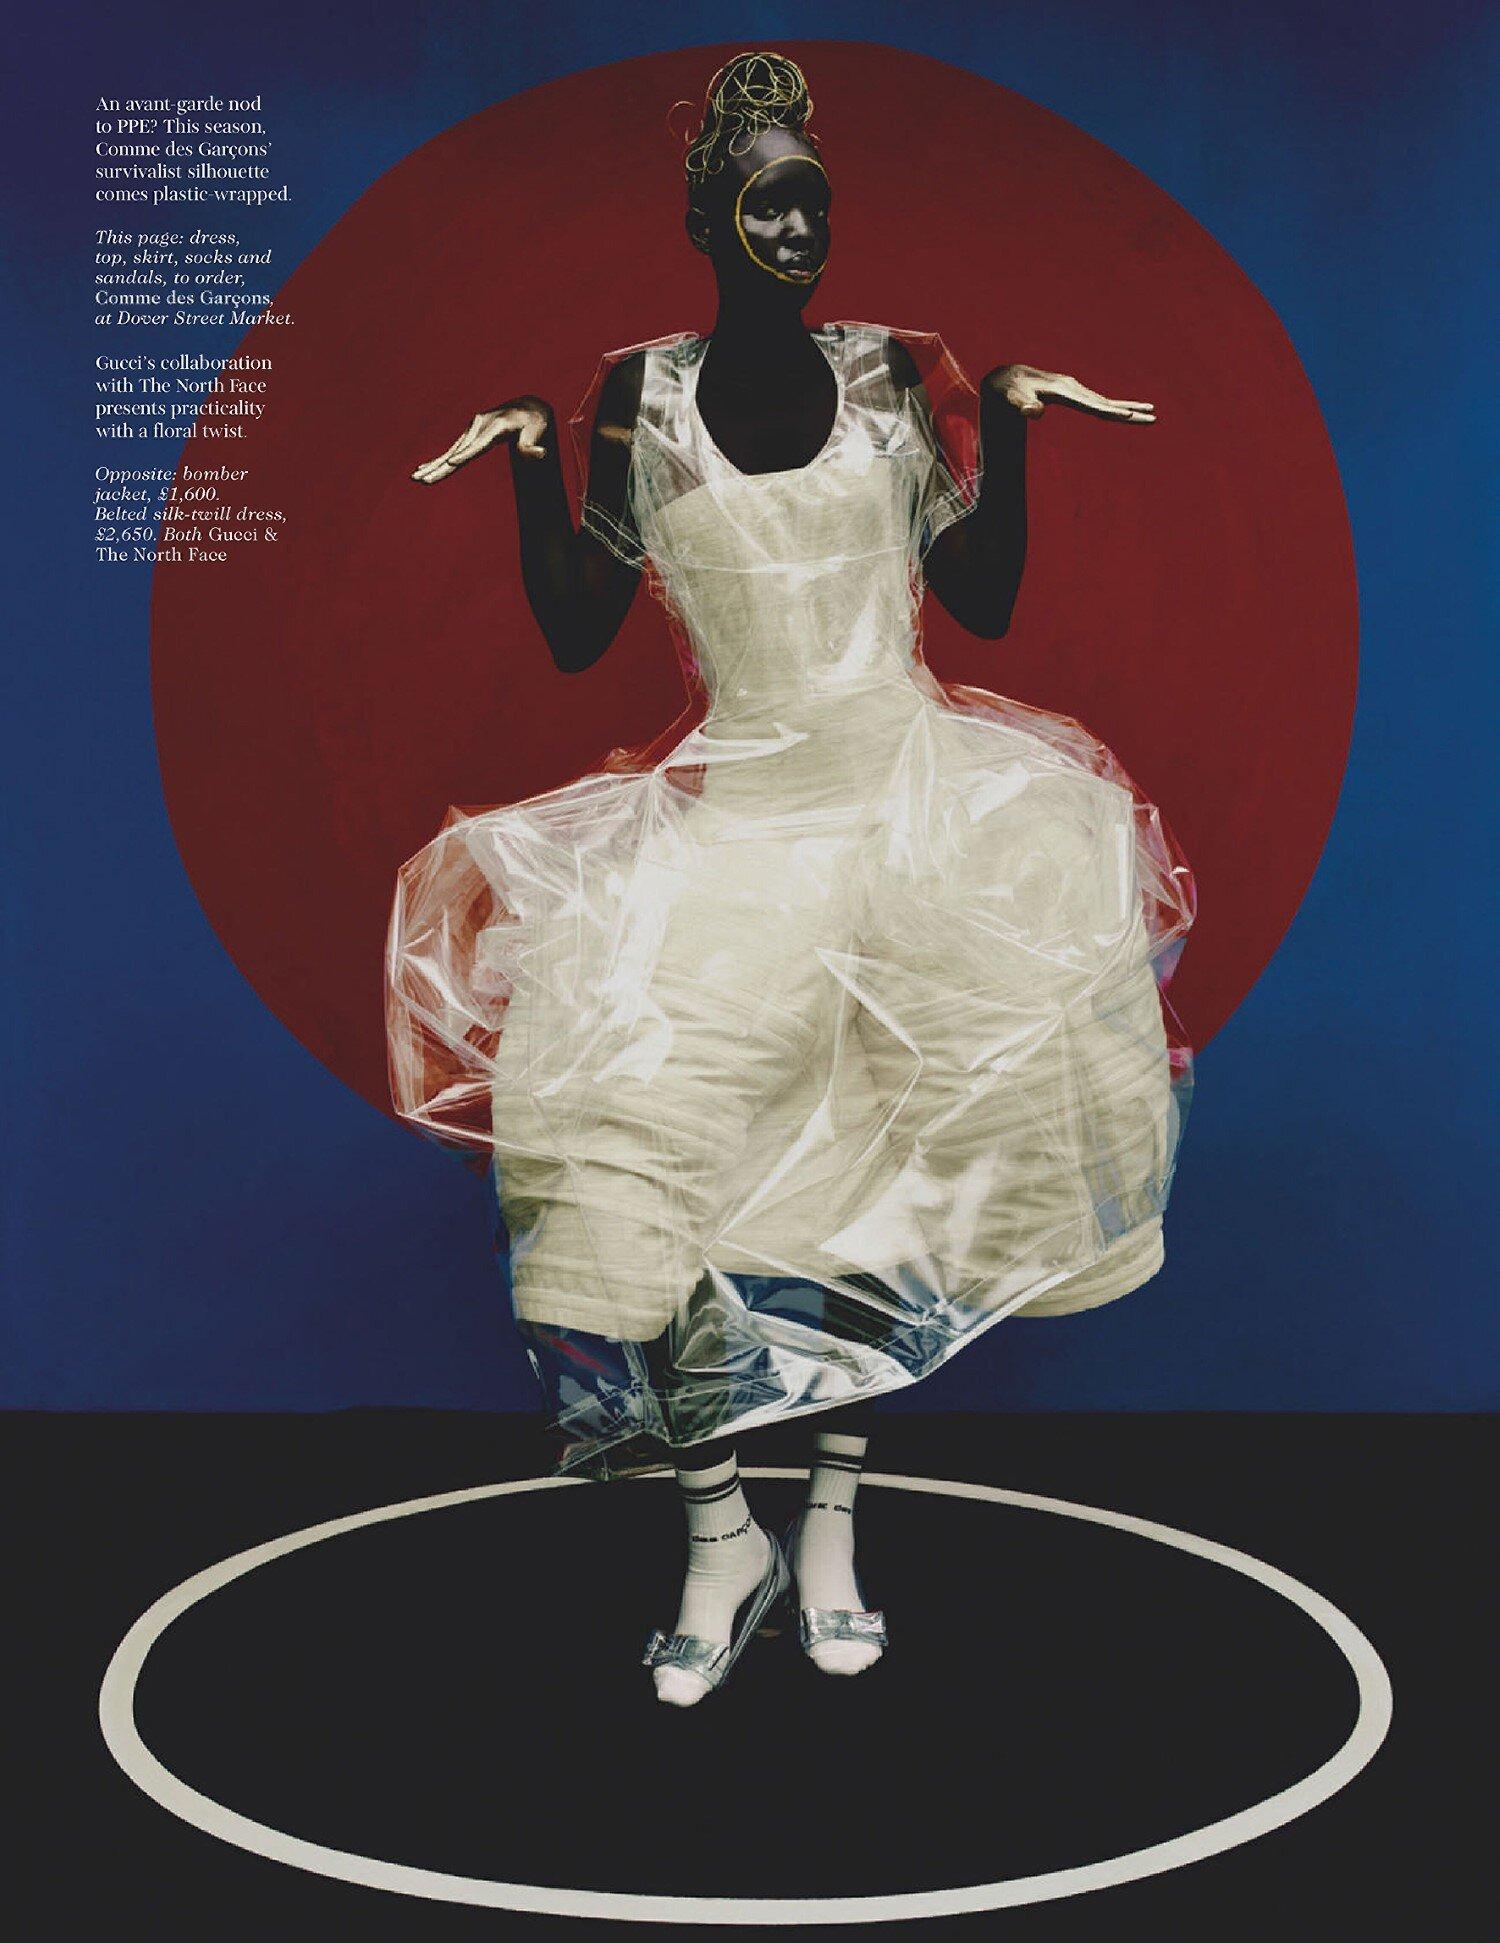 Rafael Pavarotti Brand New Ancients Vogue UK (2).jpg